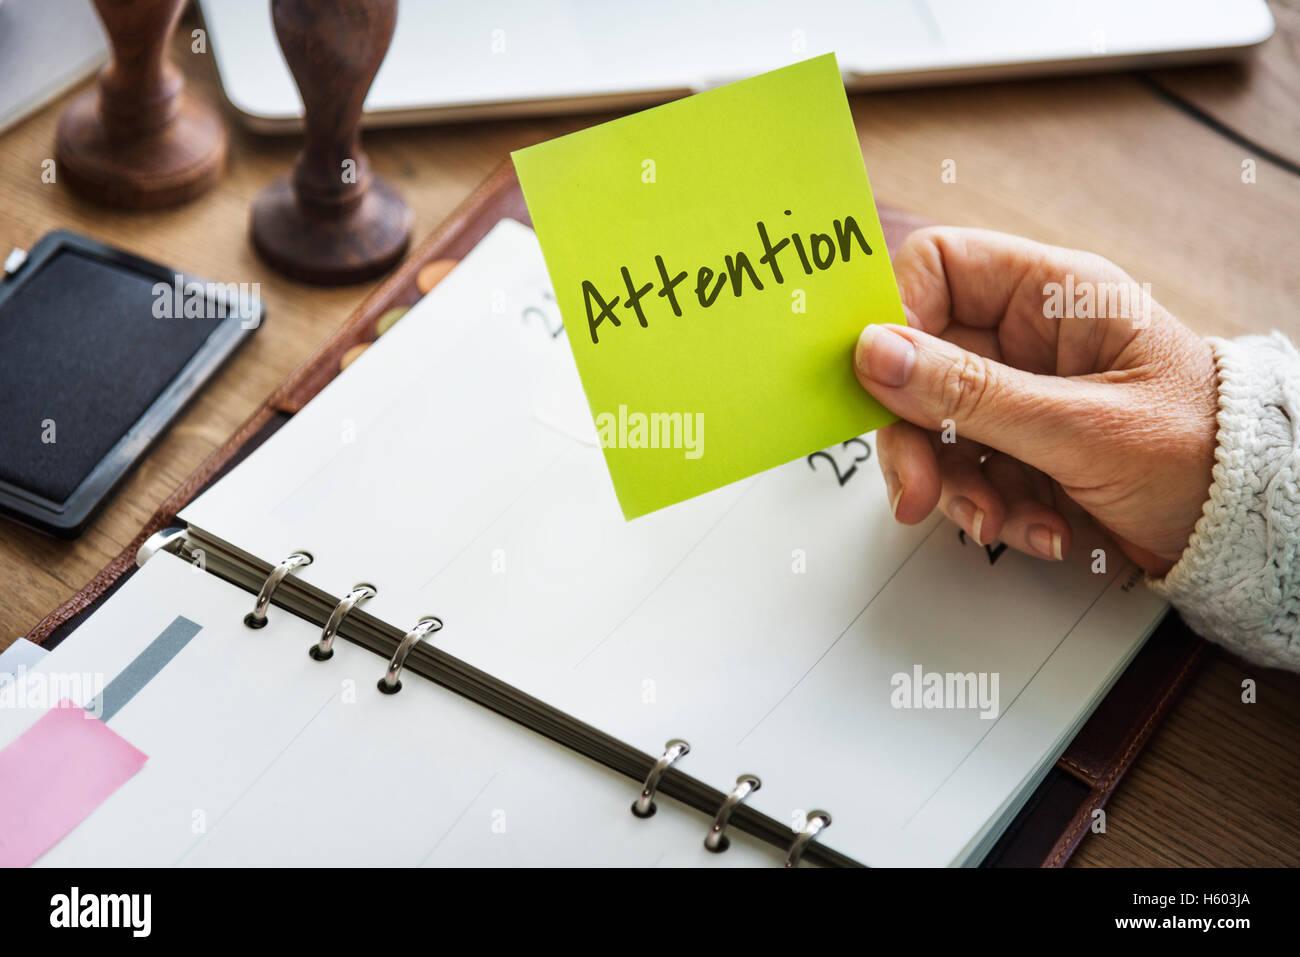 Attention Urgent Planner Agenda Concept - Stock Image